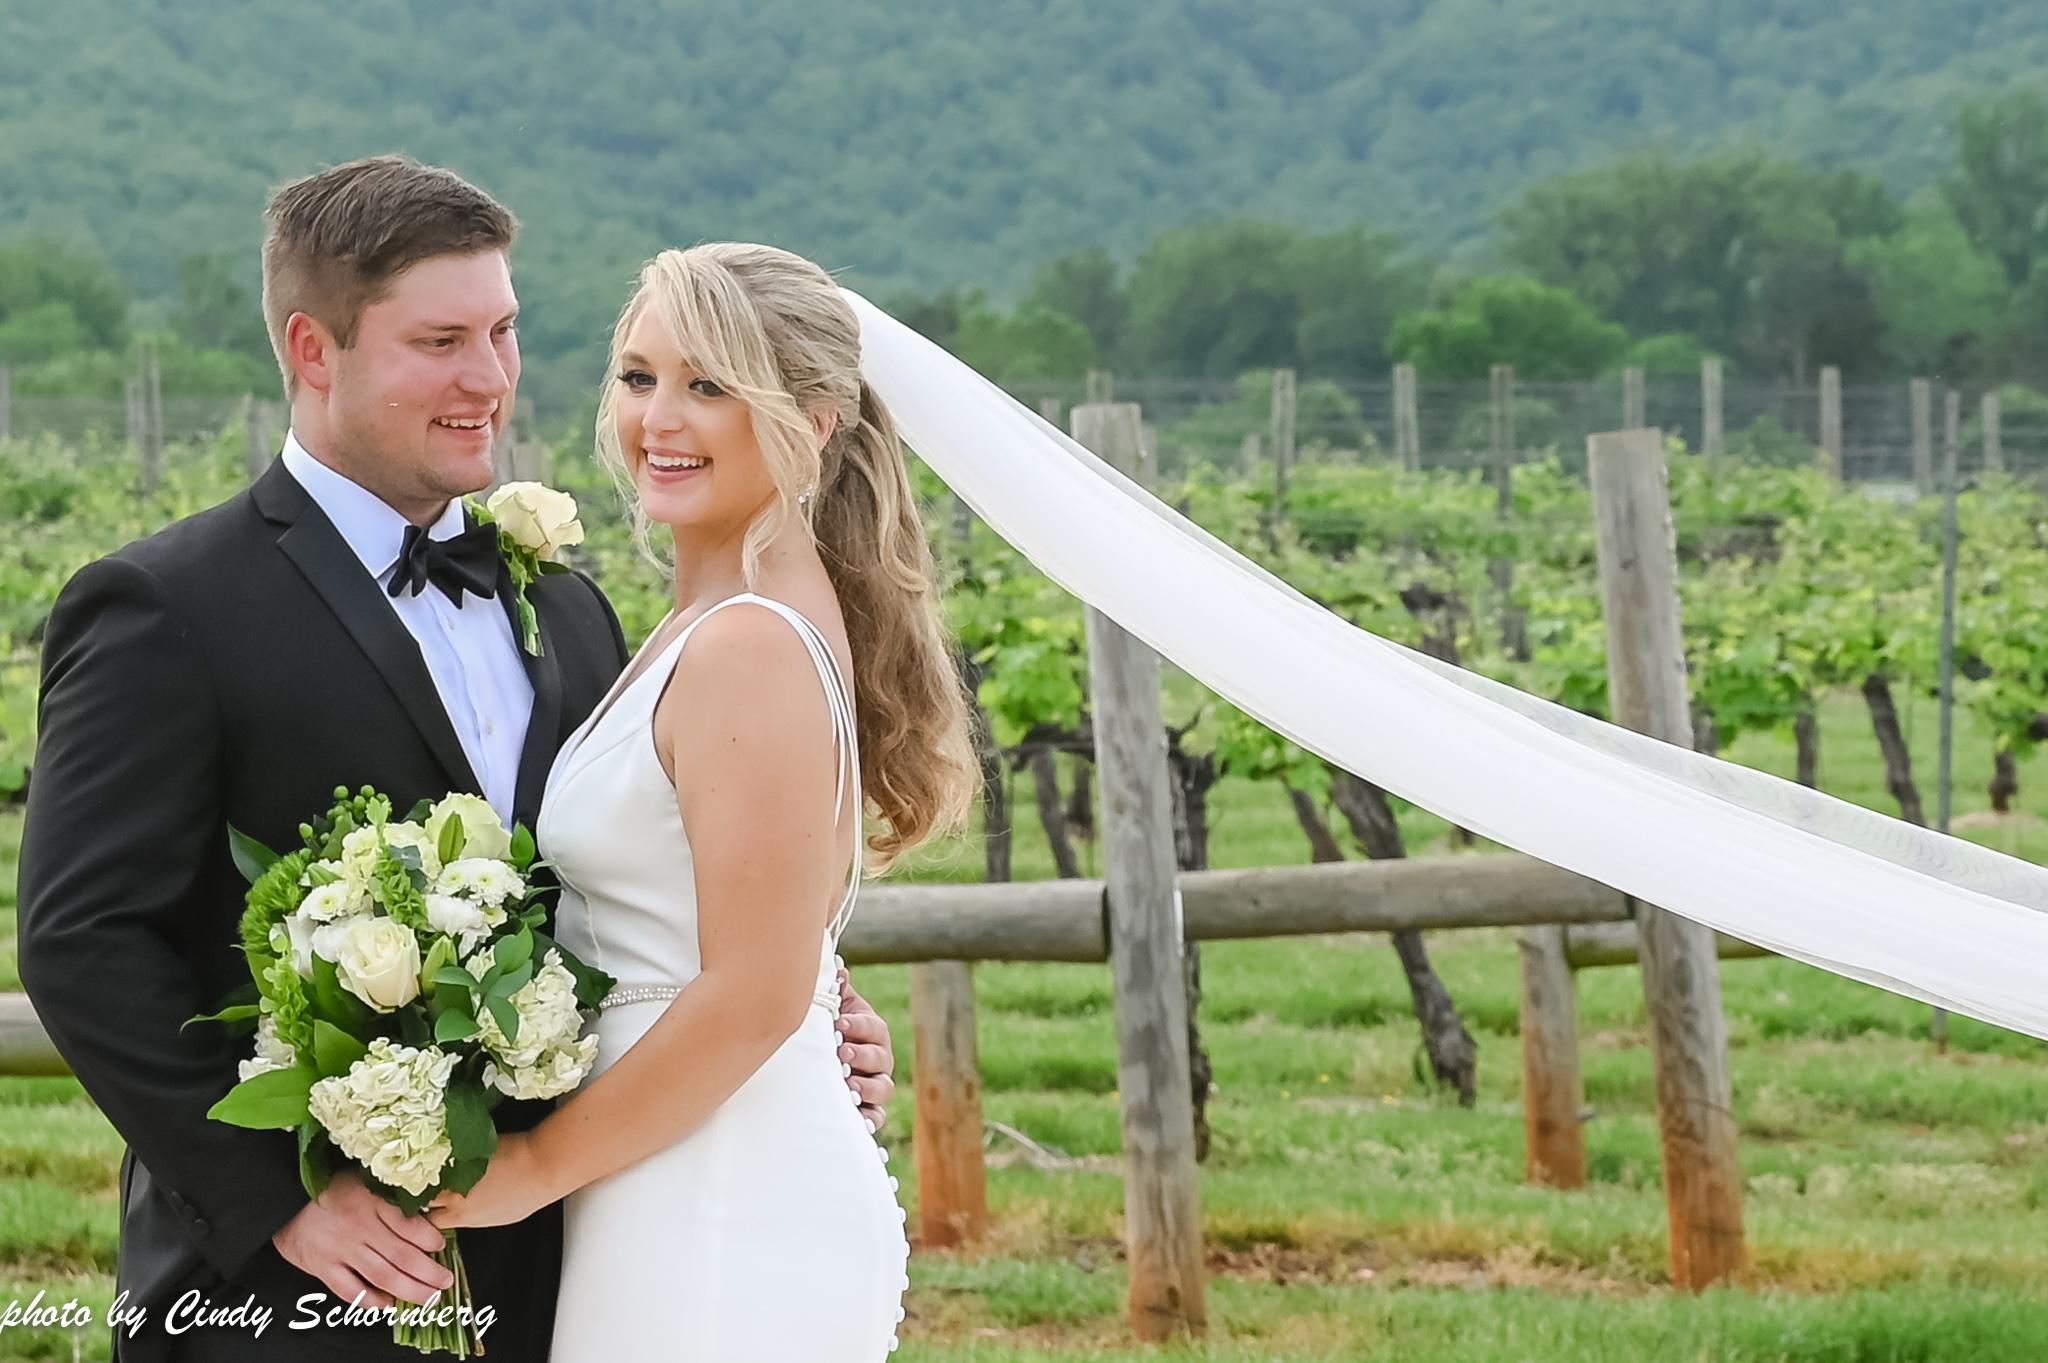 Charlottesville_Wedding_09.jpg